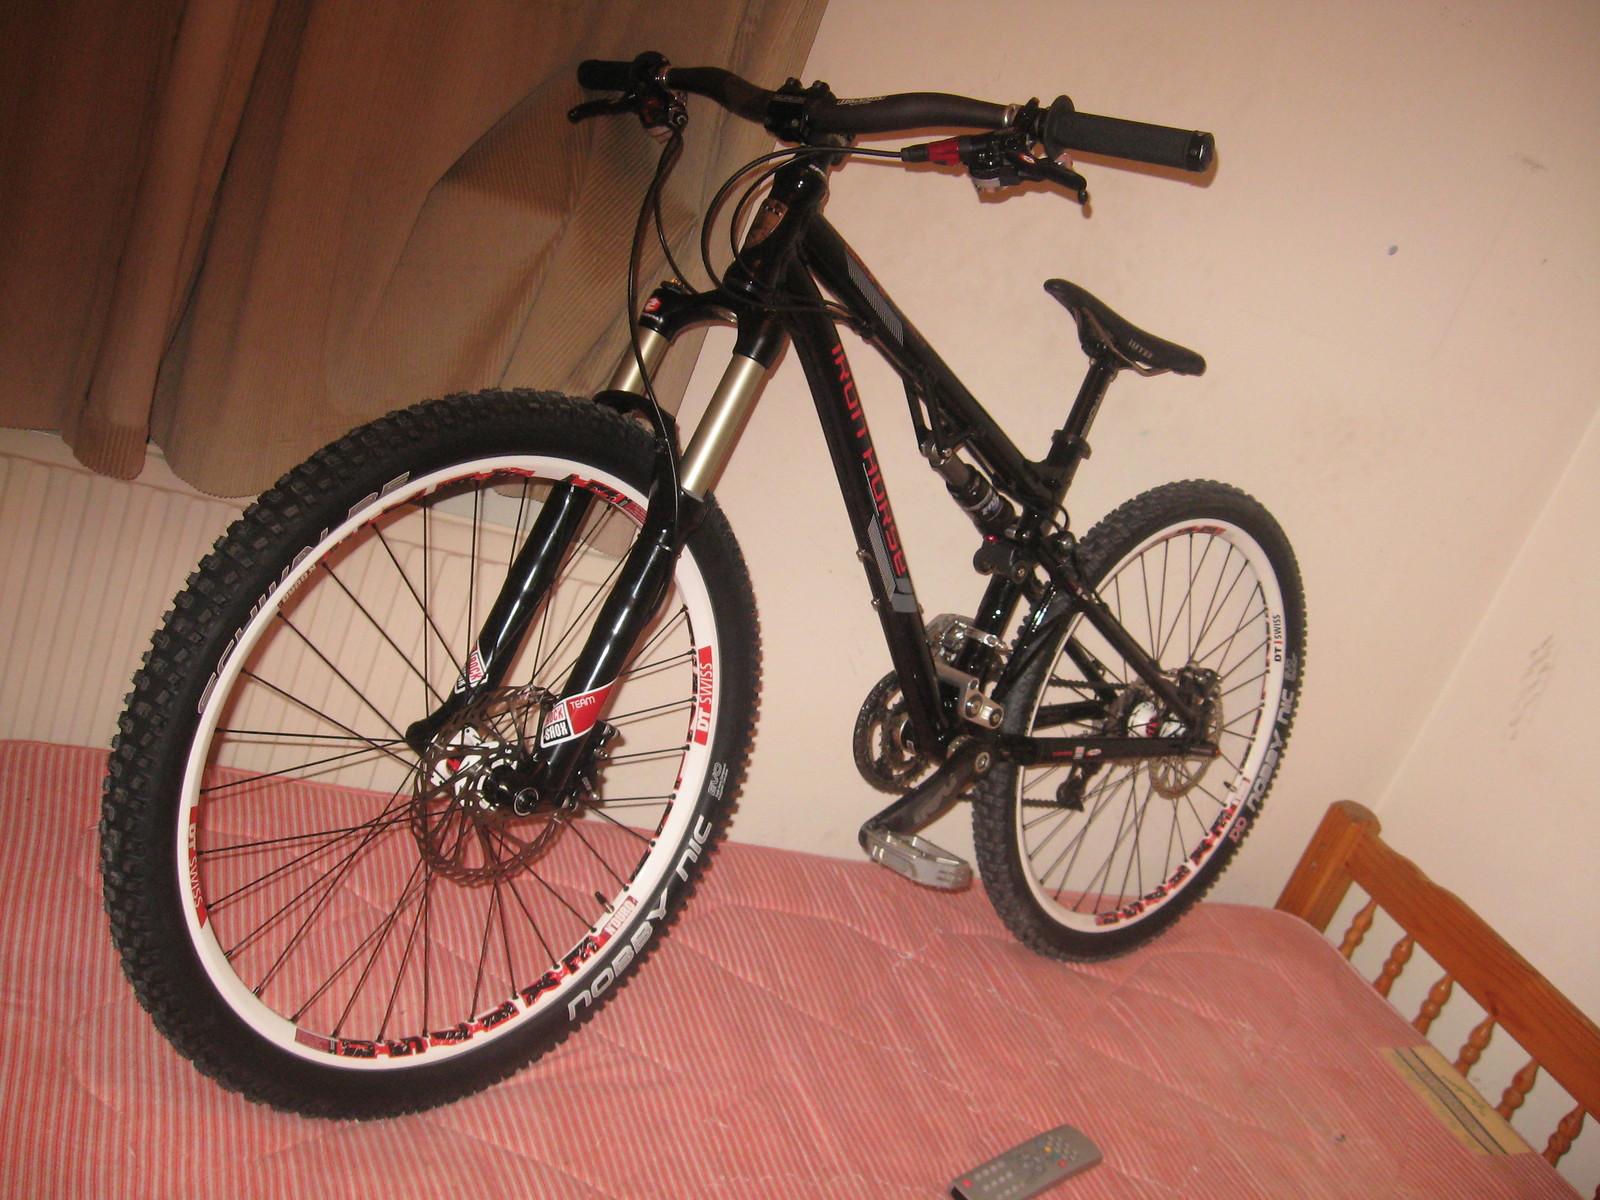 iron horse 4x - mattdallas - Mountain Biking Pictures - Vital MTB